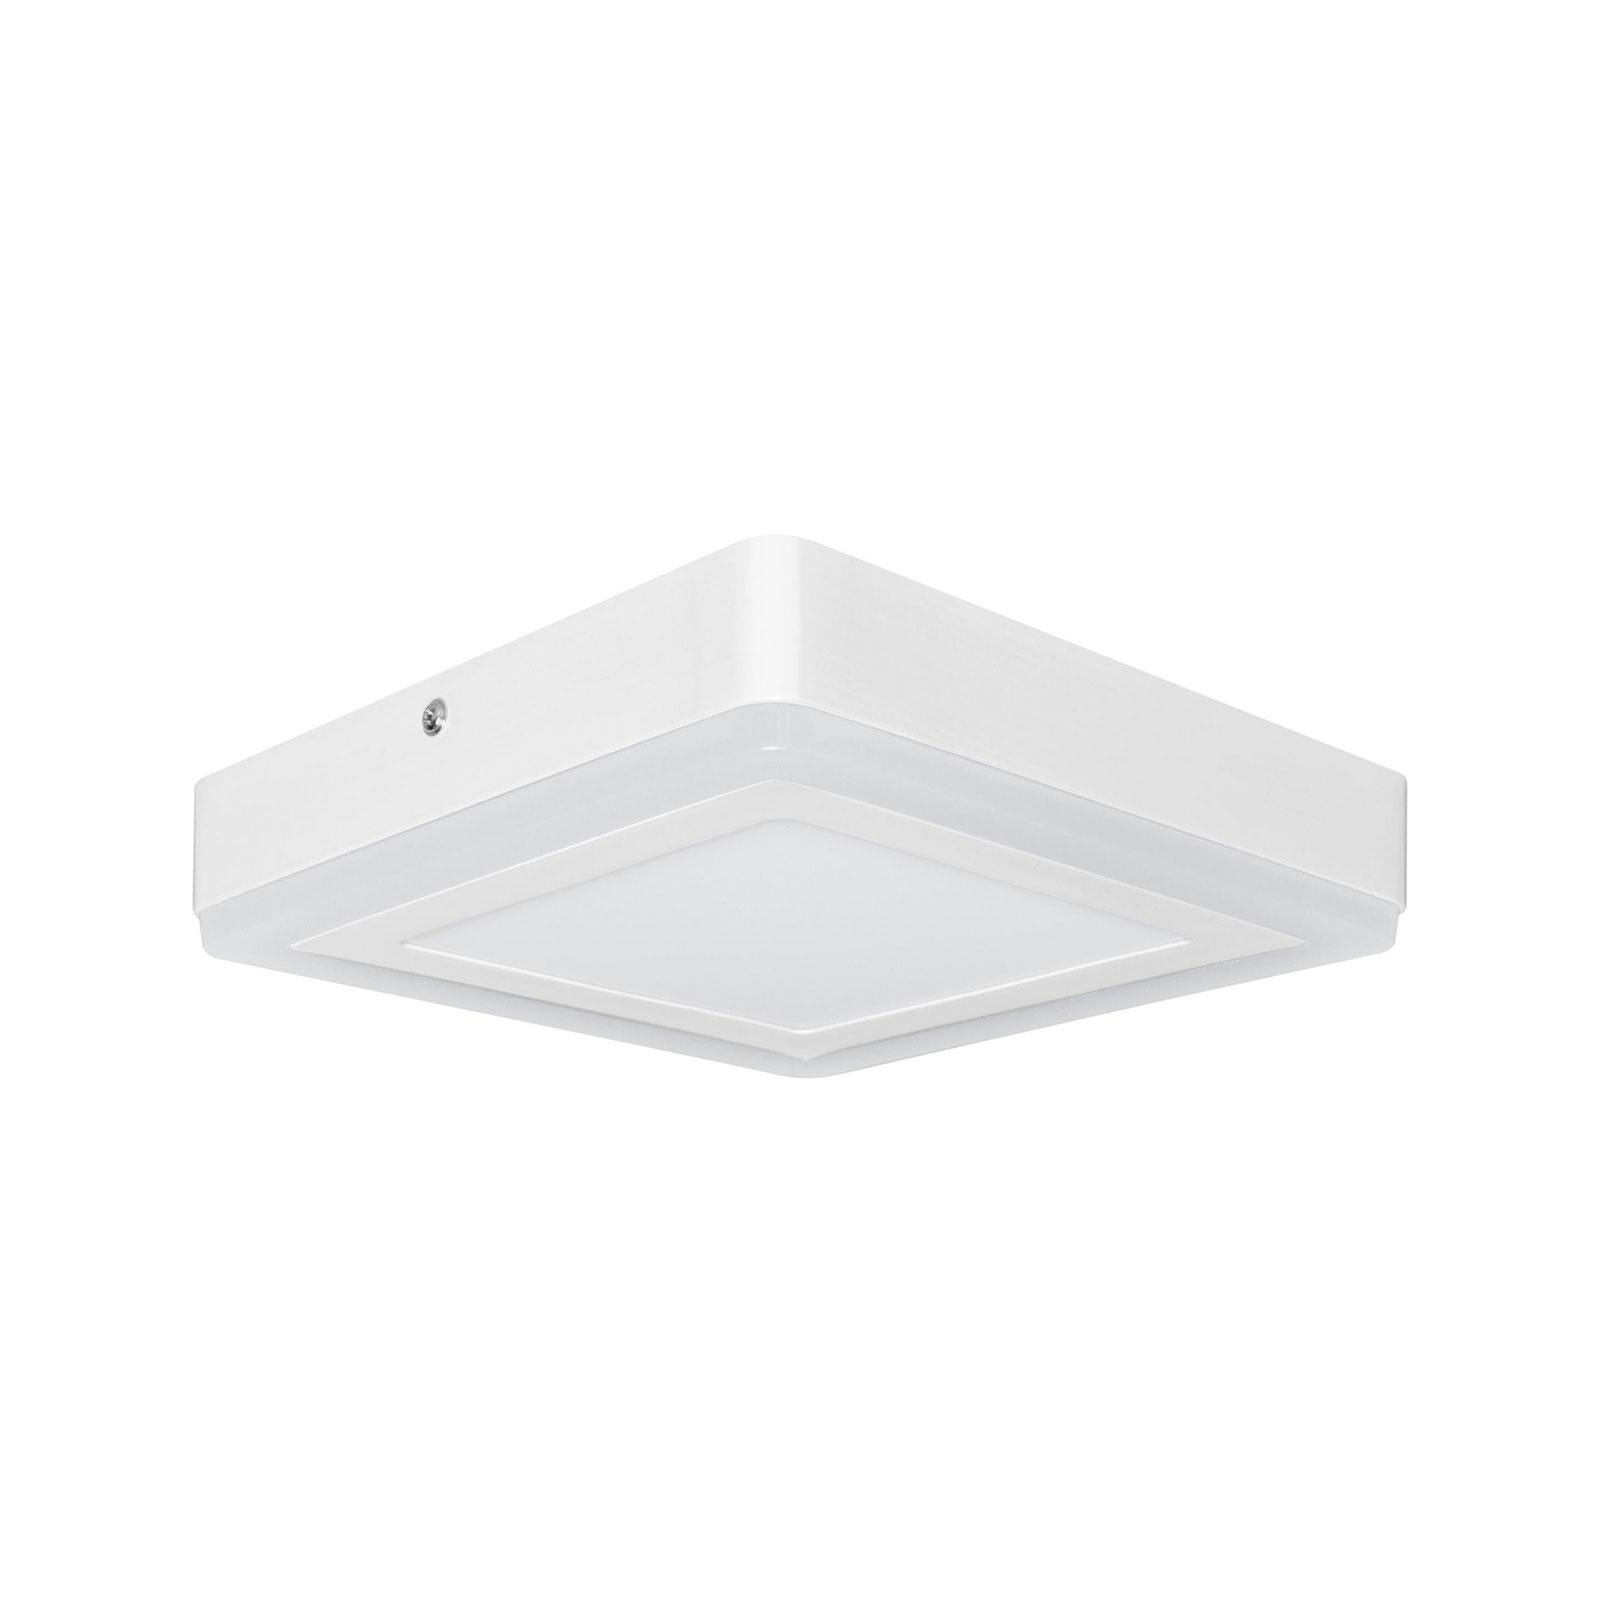 LEDVANCE LED Click White Square lampa sufitowa 20